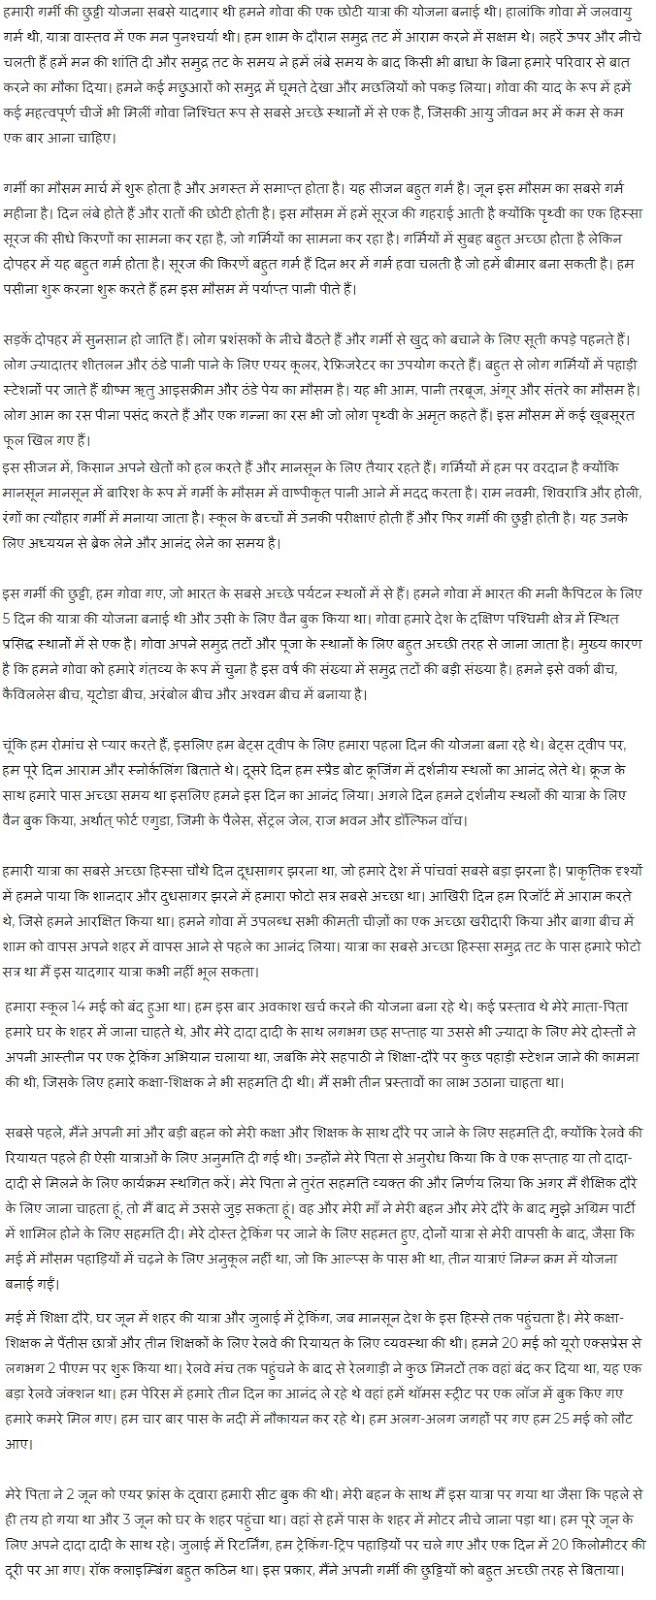 Garmi Ki Chutti Essay in Hindi – Essay on Summer Vacation in Hindi – गर्मी की छुट्टियों पर निबंध